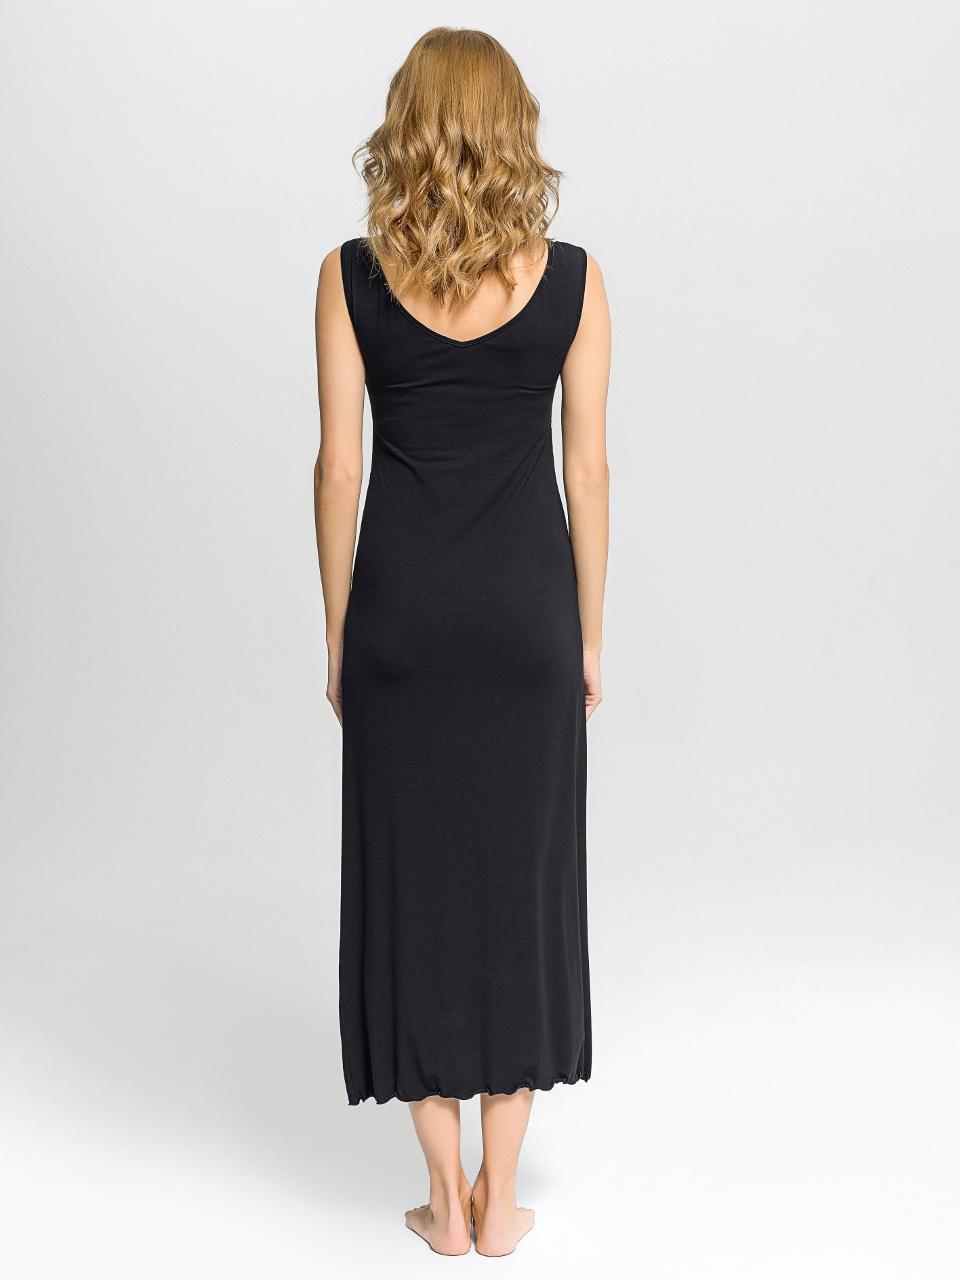 B46 Camicia da notte<br />01 Ivory, 02 Black, 07 Ruby, 63 Hyacinth